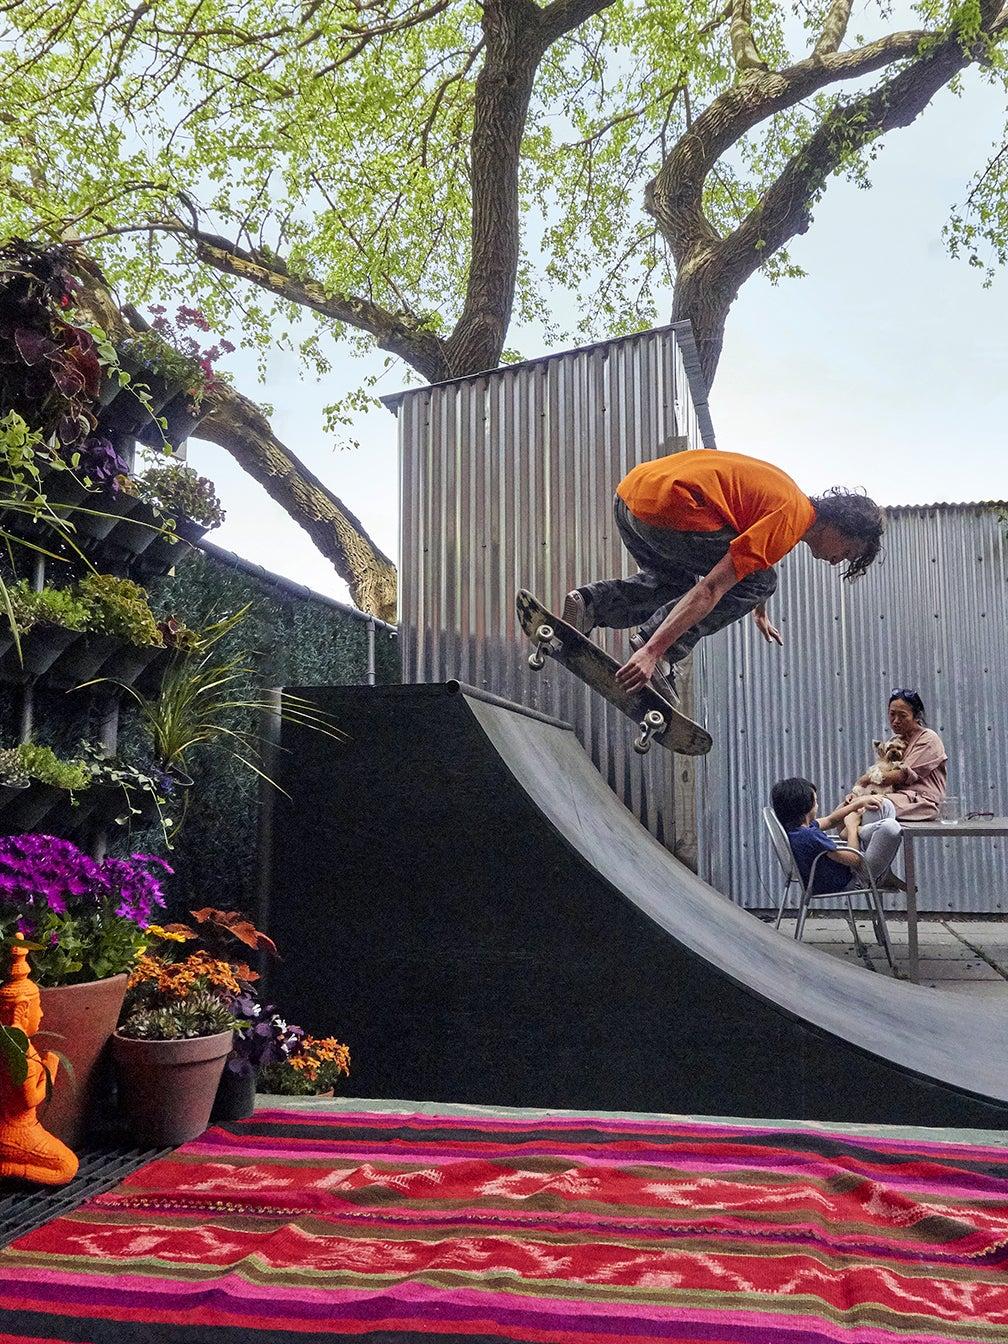 Max skating on the ramp